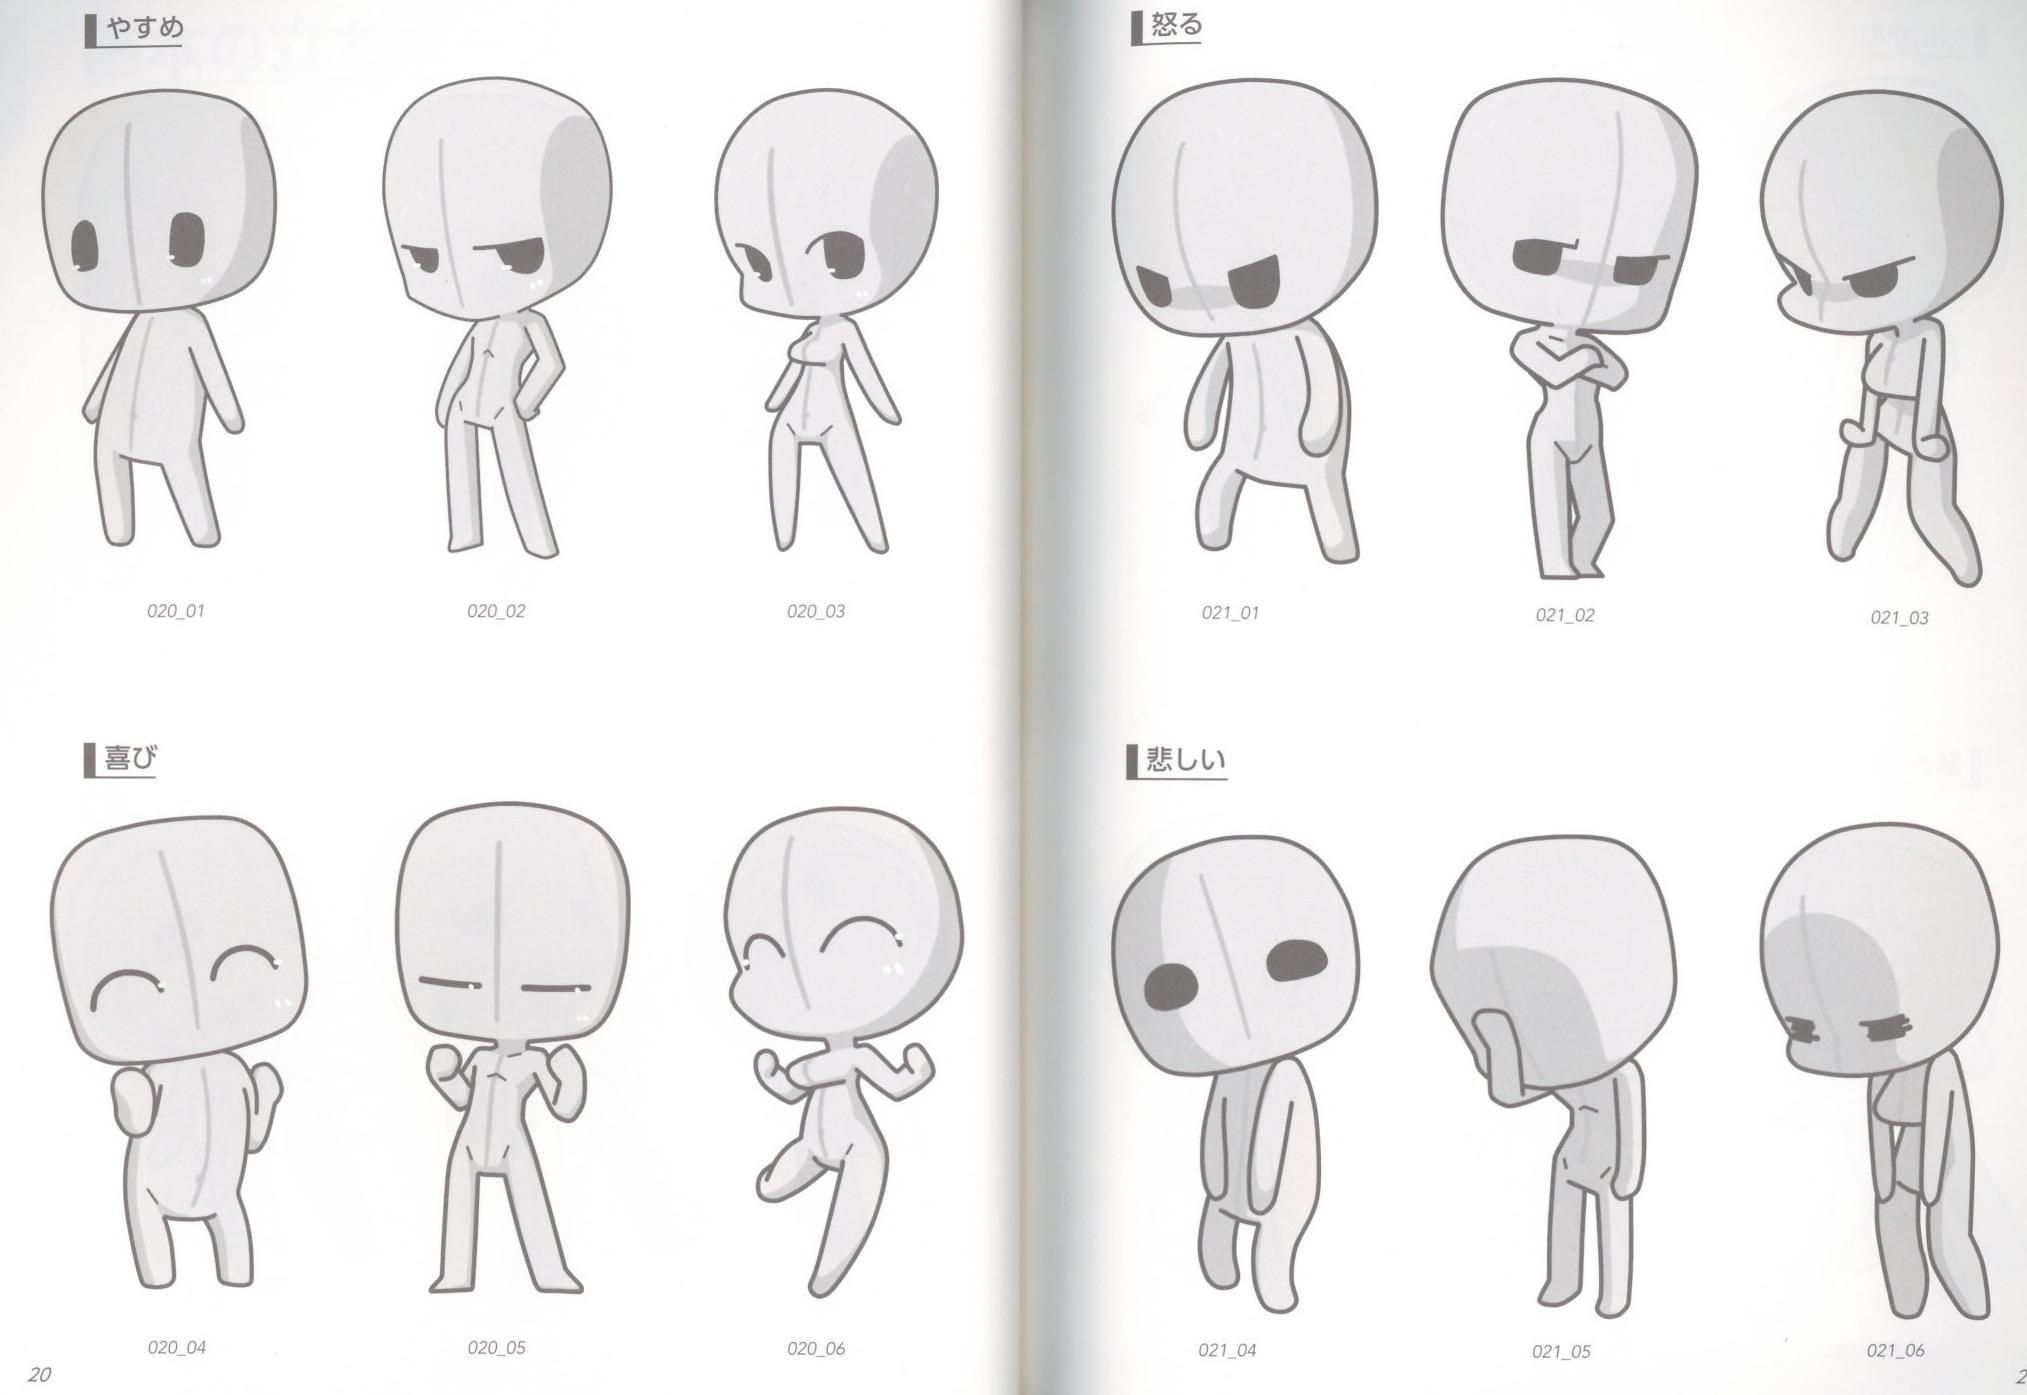 How To Draw Manga Super Deform Pose Chibi Character Ver Chibi Drawings Chibi Characters Chibi Sketch